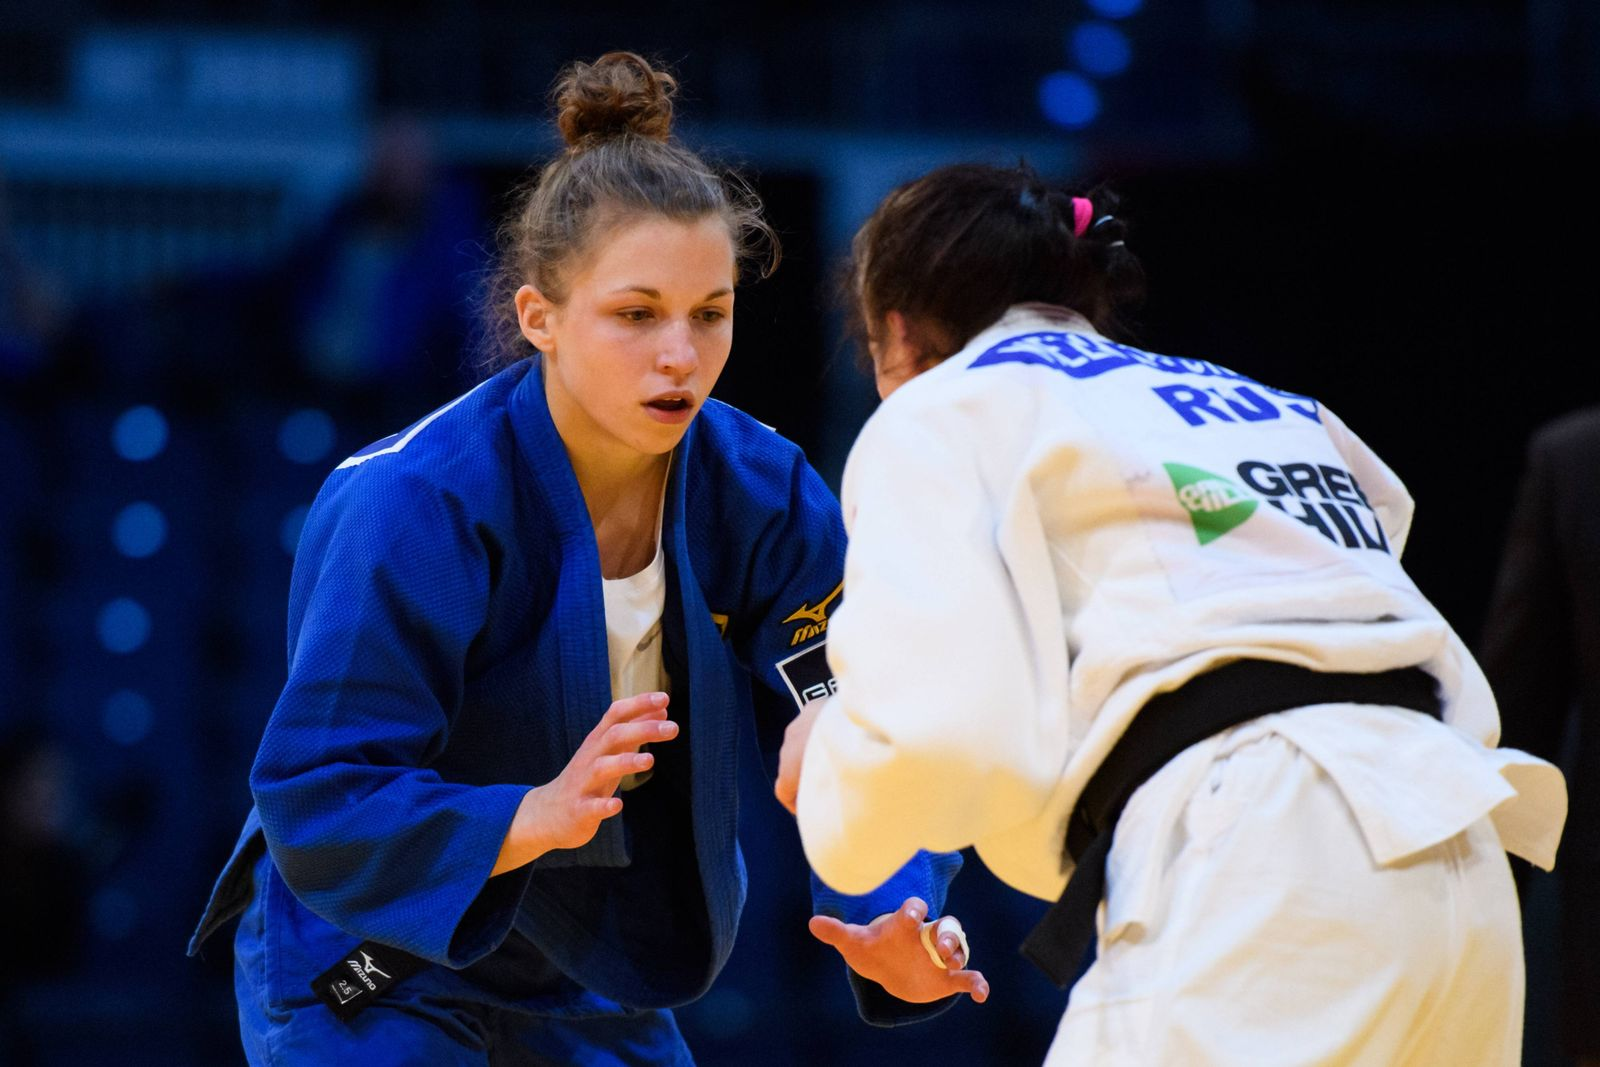 24 02 2017 Mitsubishi Electric Hall Duesseldorf Judo Grand Prix Düsseldorf Duesseldorf 2017 Vi